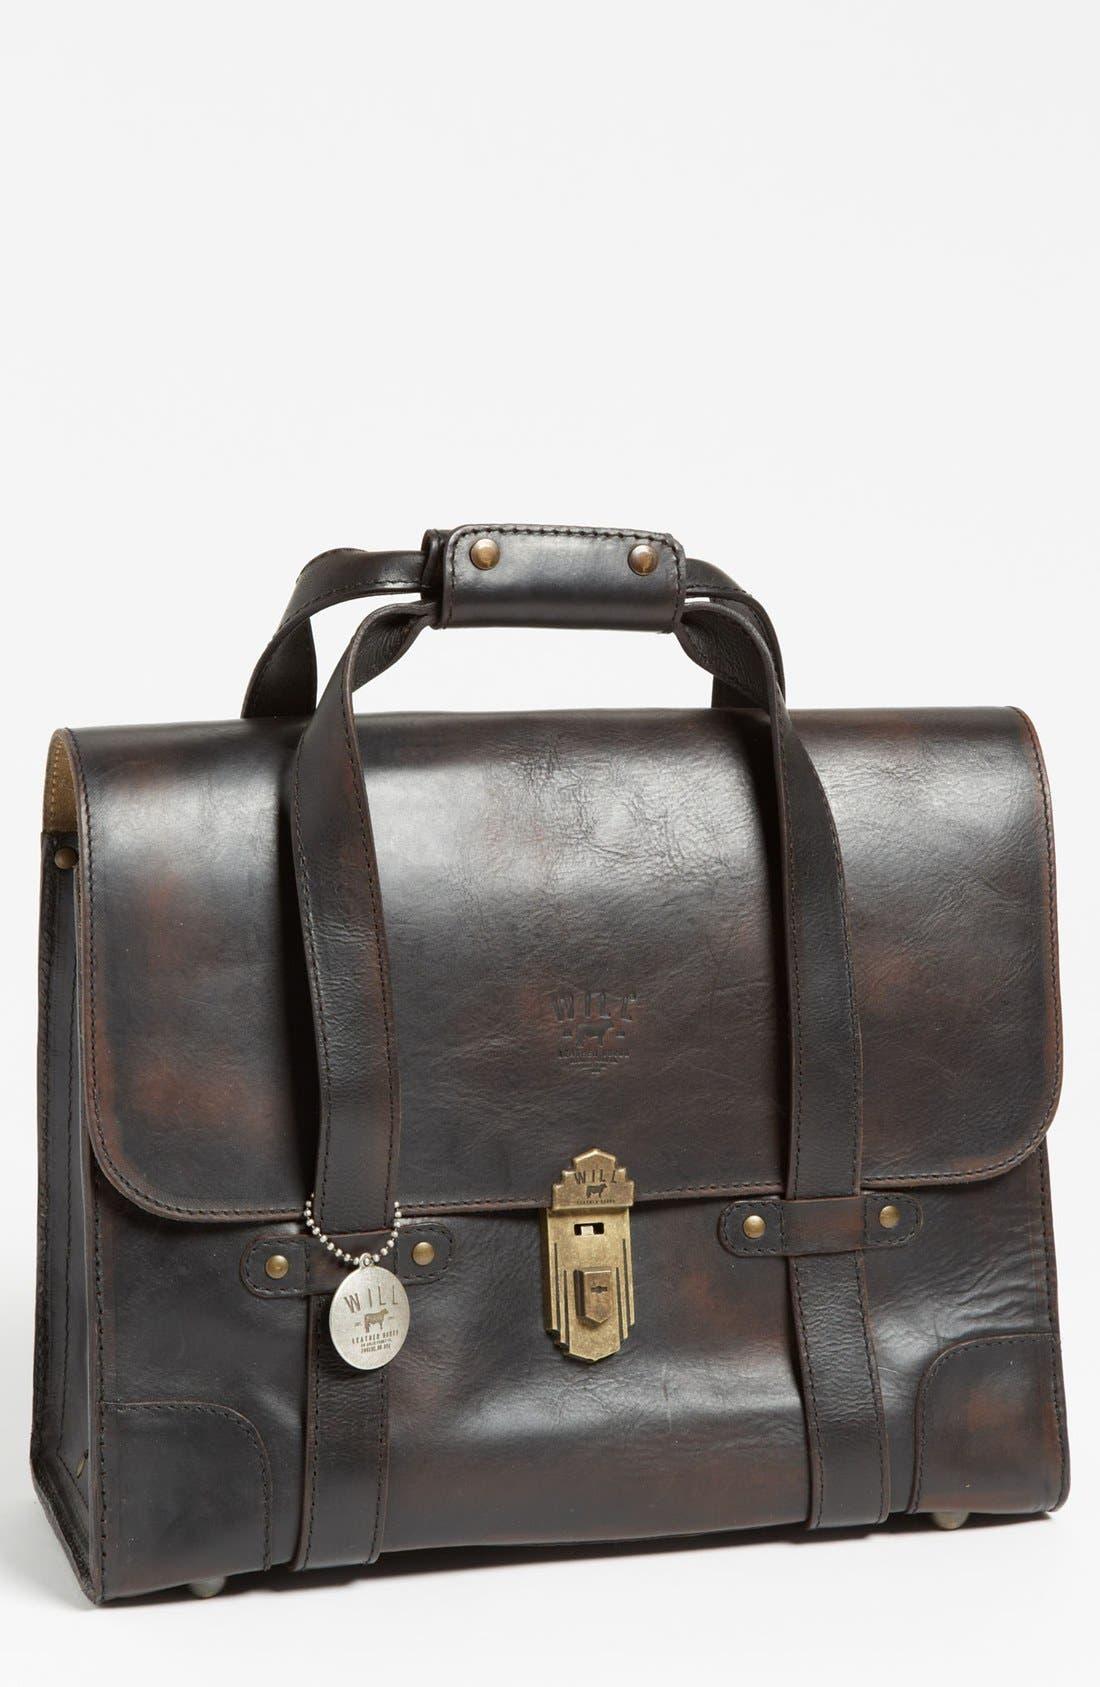 Alternate Image 1 Selected - Will Leather Goods 'Everett' Satchel